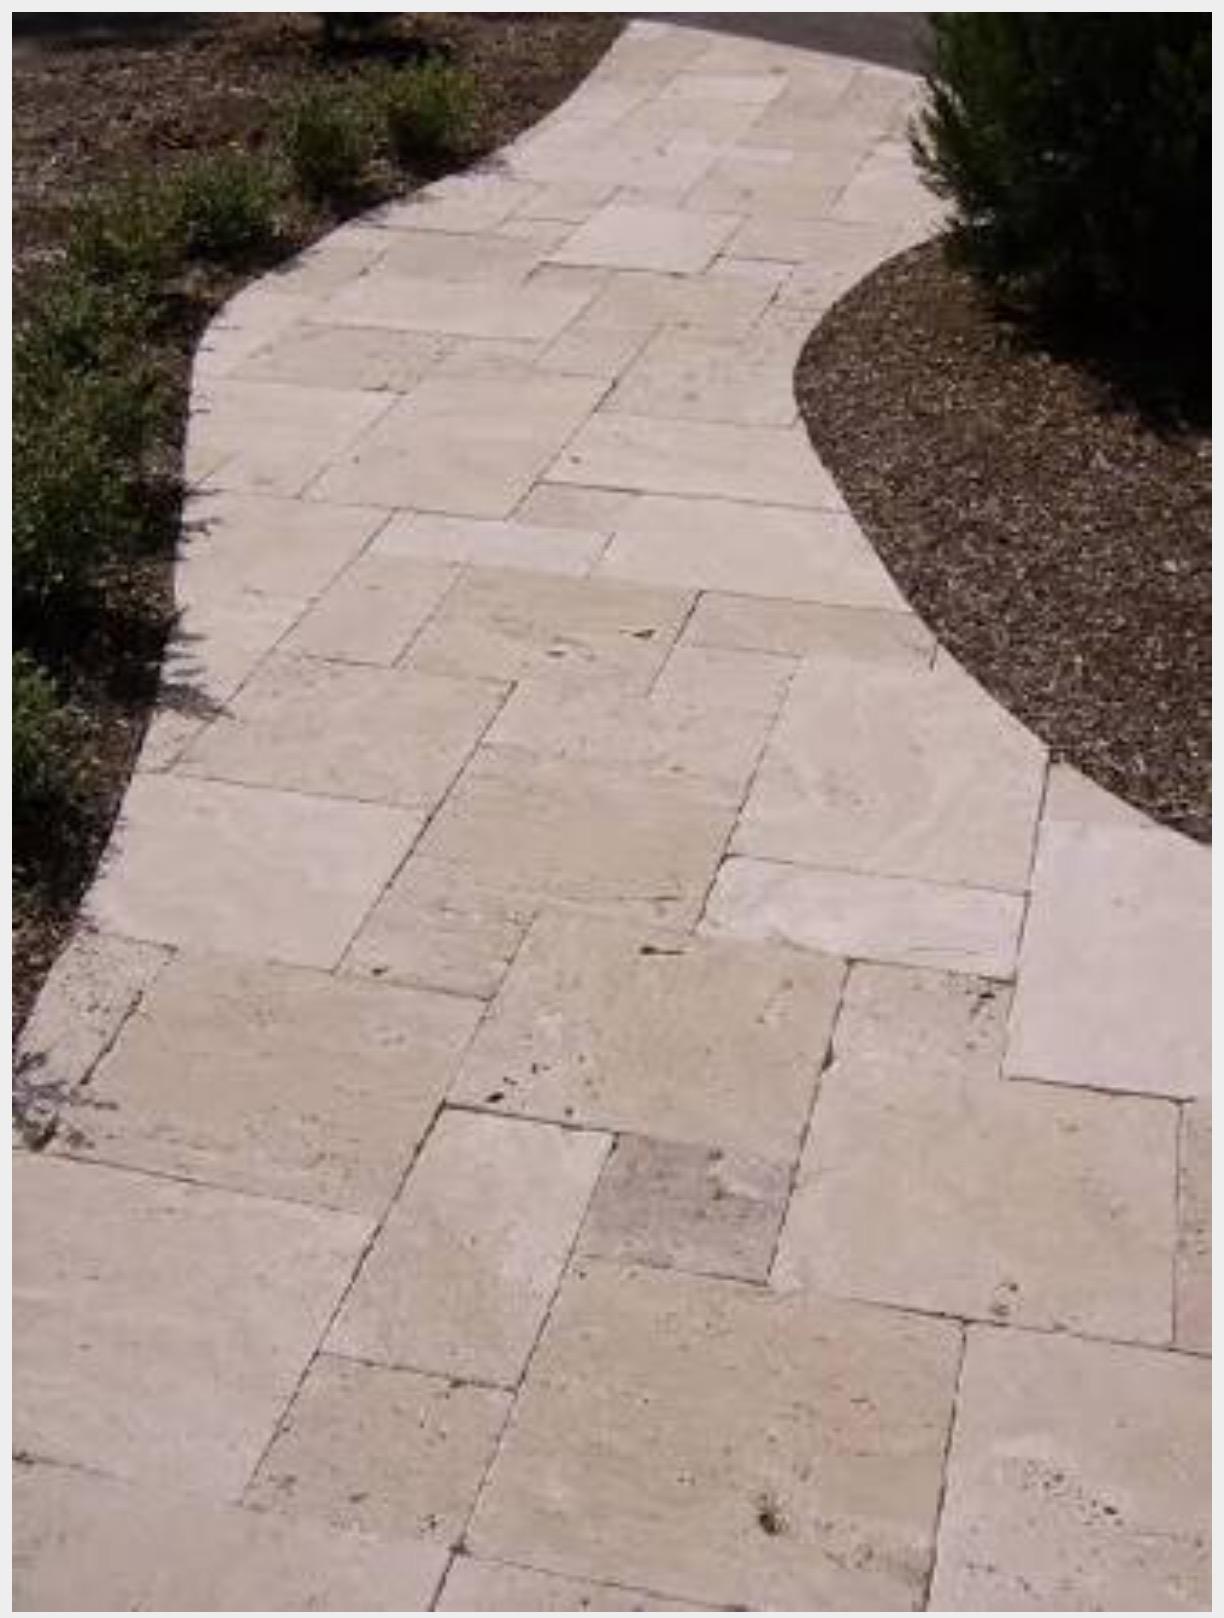 Outdoor Tiles Pavers - Travertine Sydney supplying tiles ...